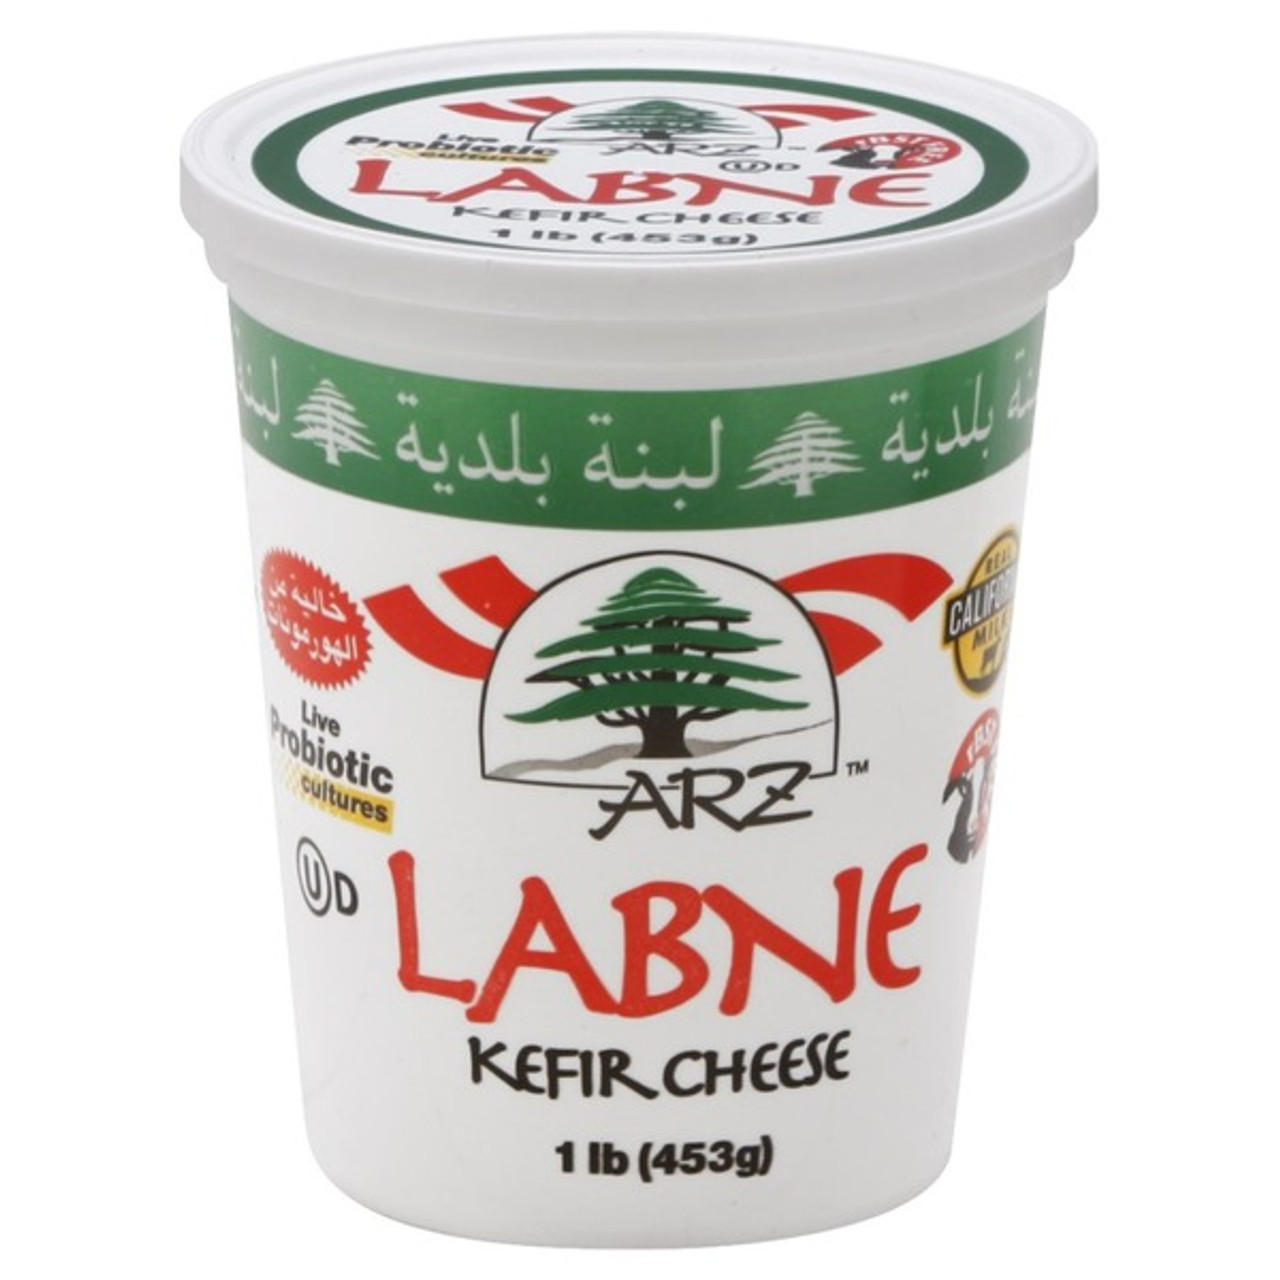 Arz Kefir Cheese, Labne 1 lb